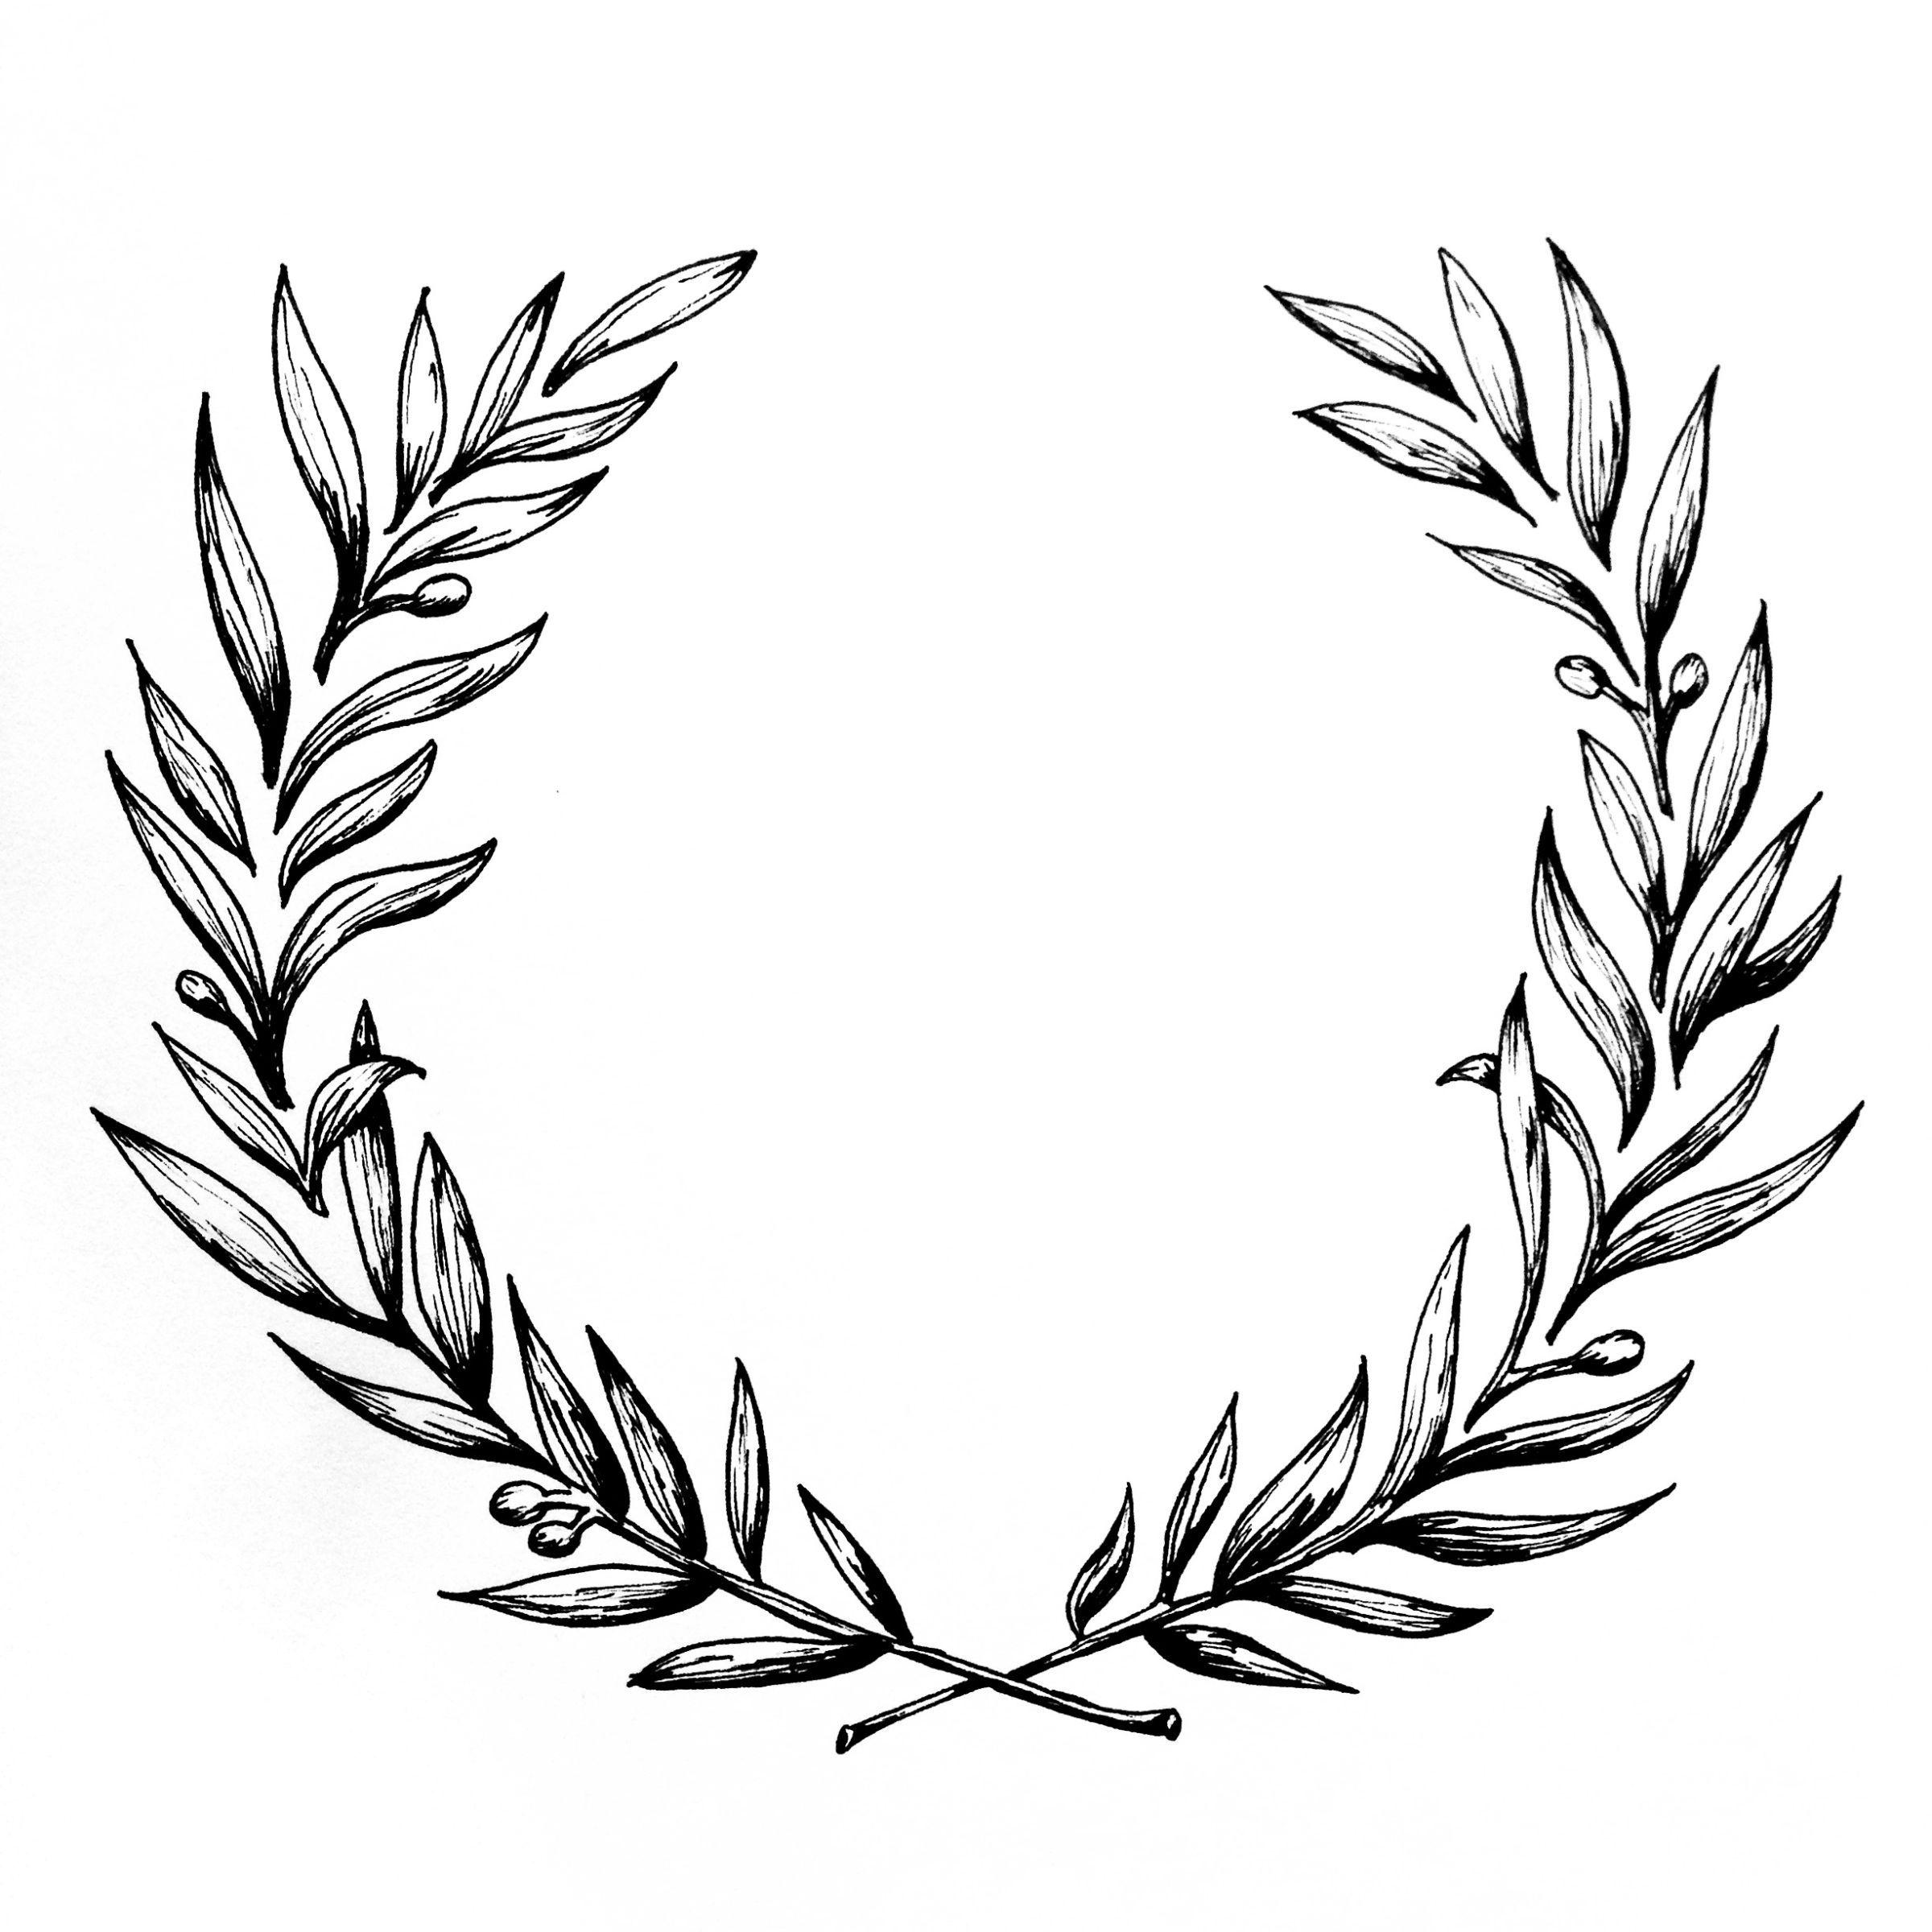 Ornate Wreath – Amy Rochelle Press,  #Amy #laurelwreathtattoo #Ornate #Press #Rochelle #Wreath